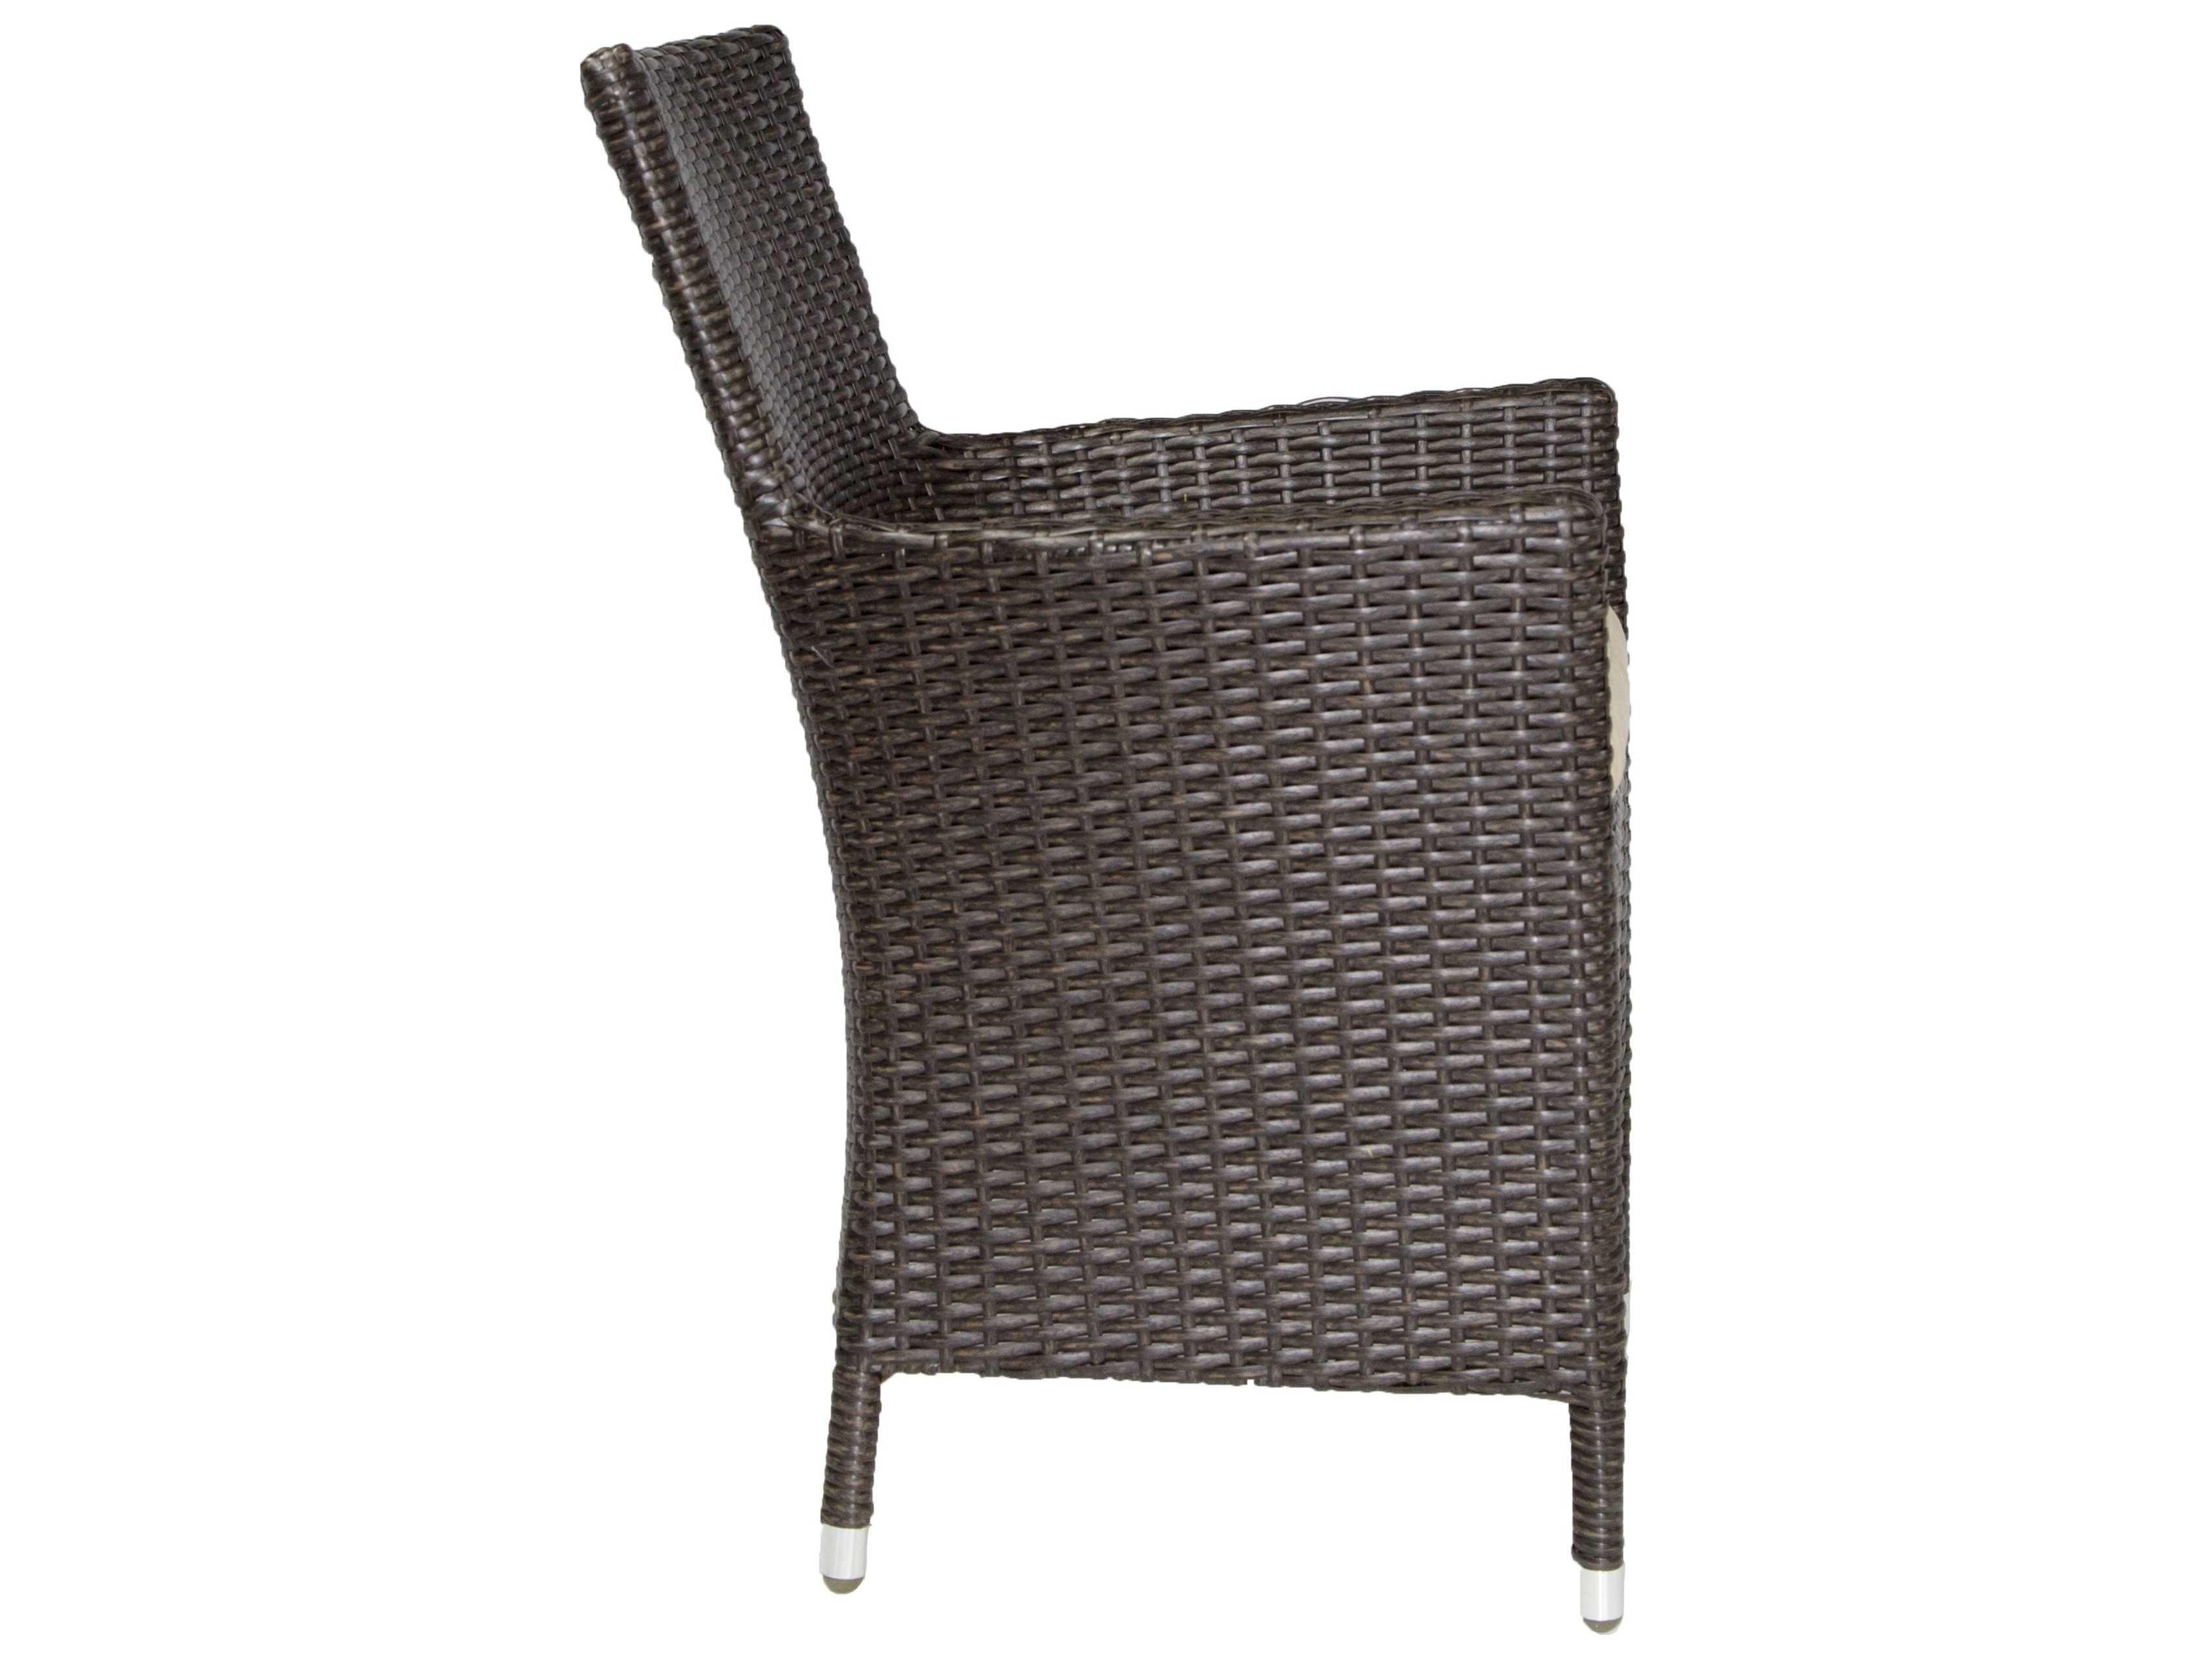 Patio heaven malibu wicker arm chair paphmac for Patio heaven